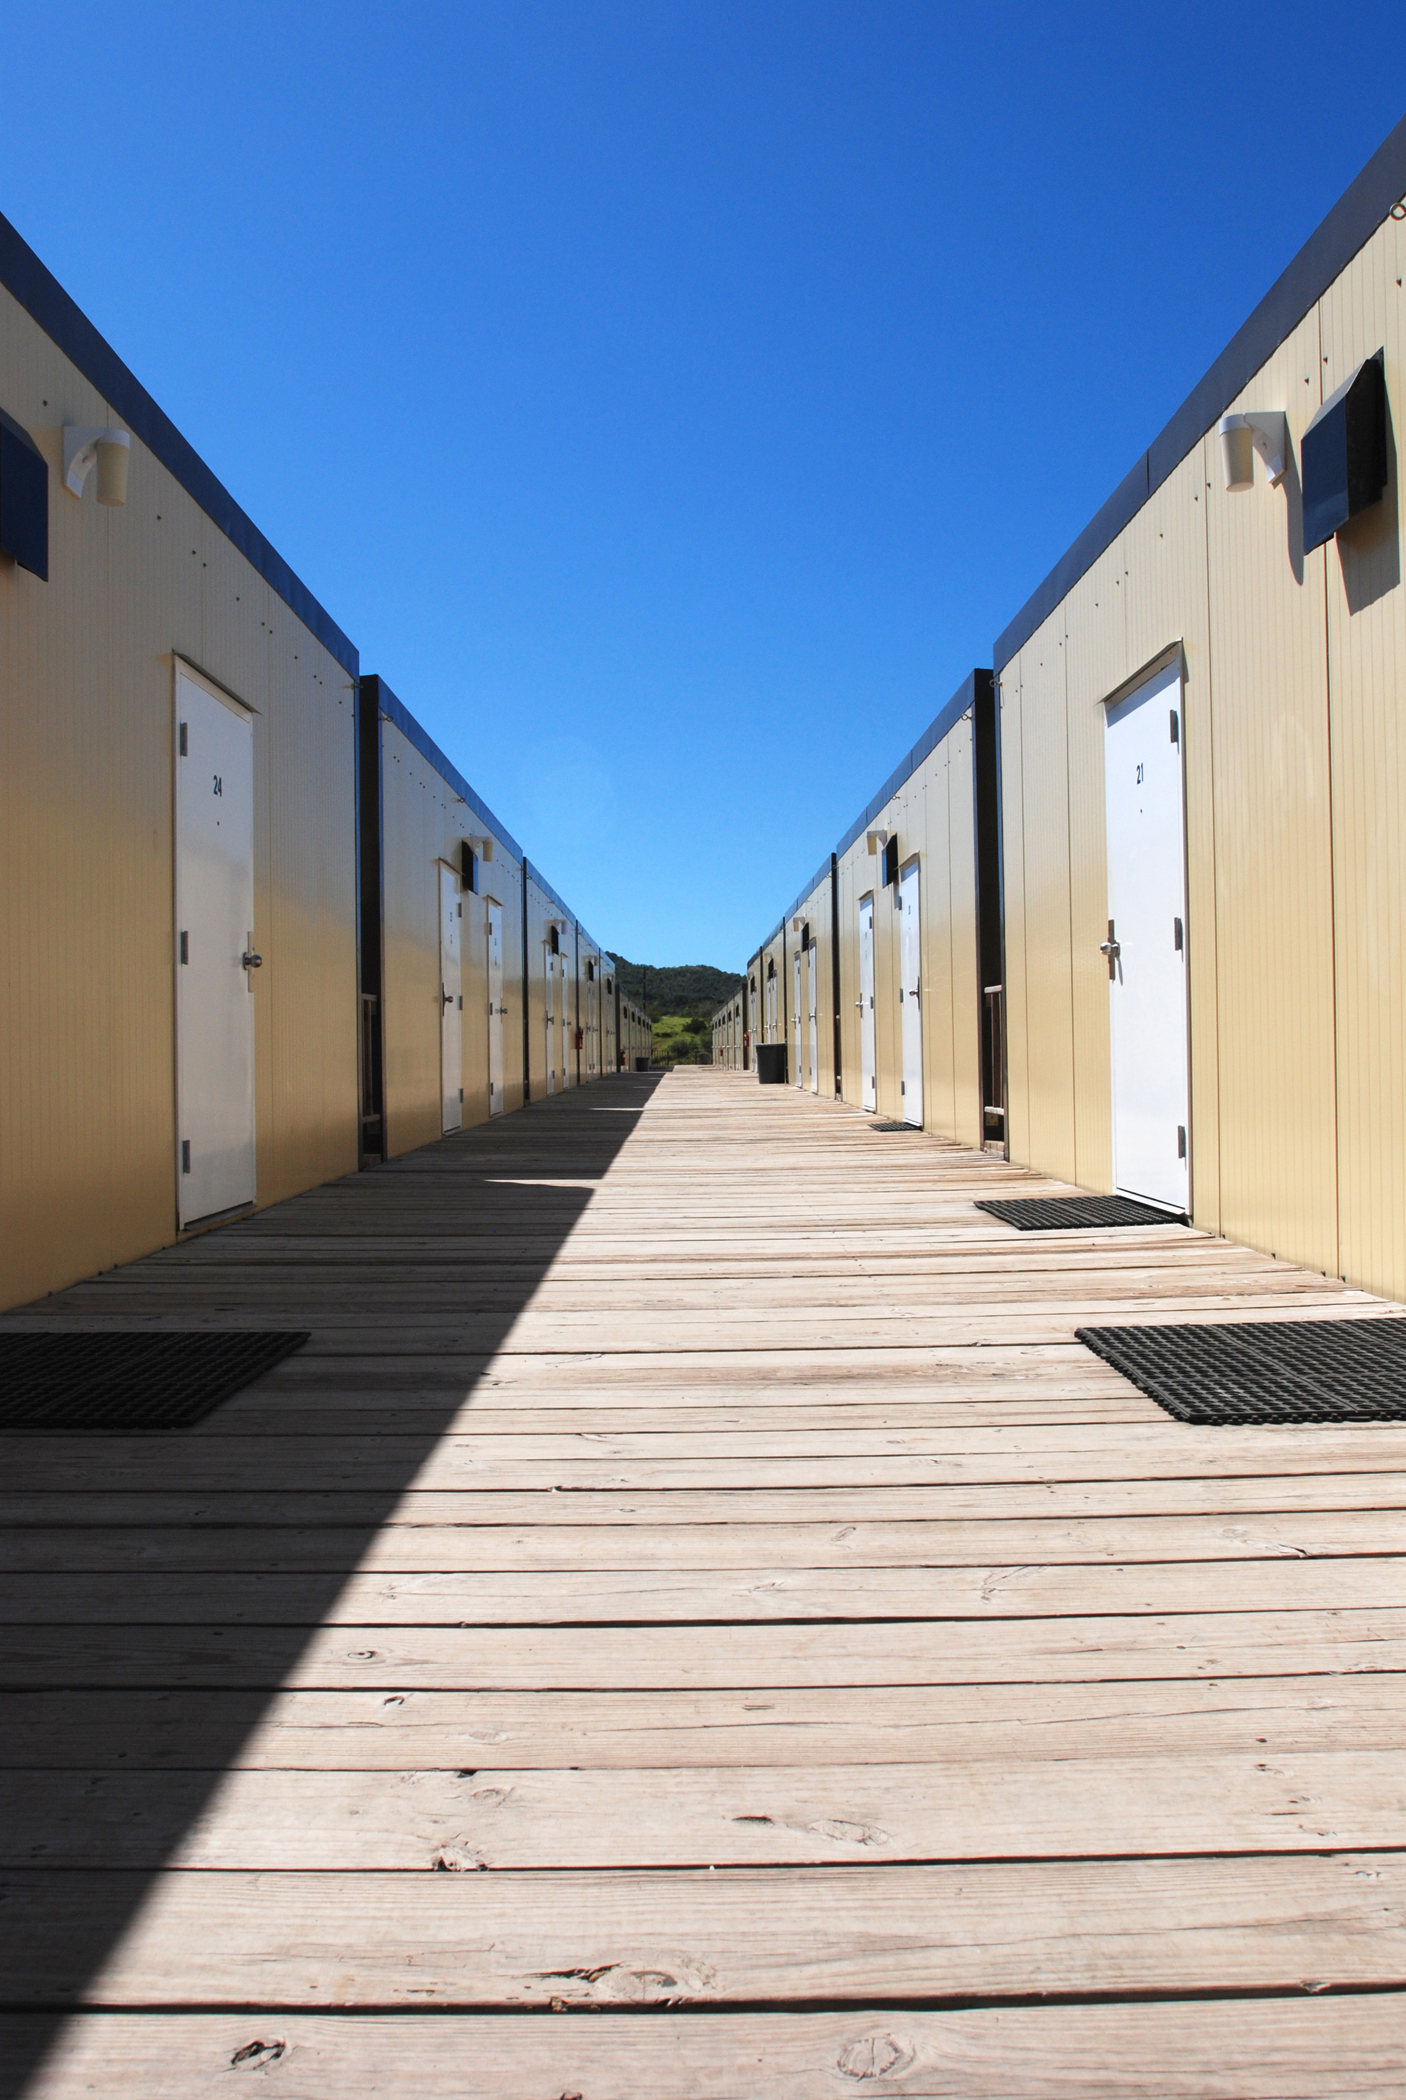 office chair jtf blue spandex covers file cuzco wells barracks 39 boardwalk guantanamo jpg